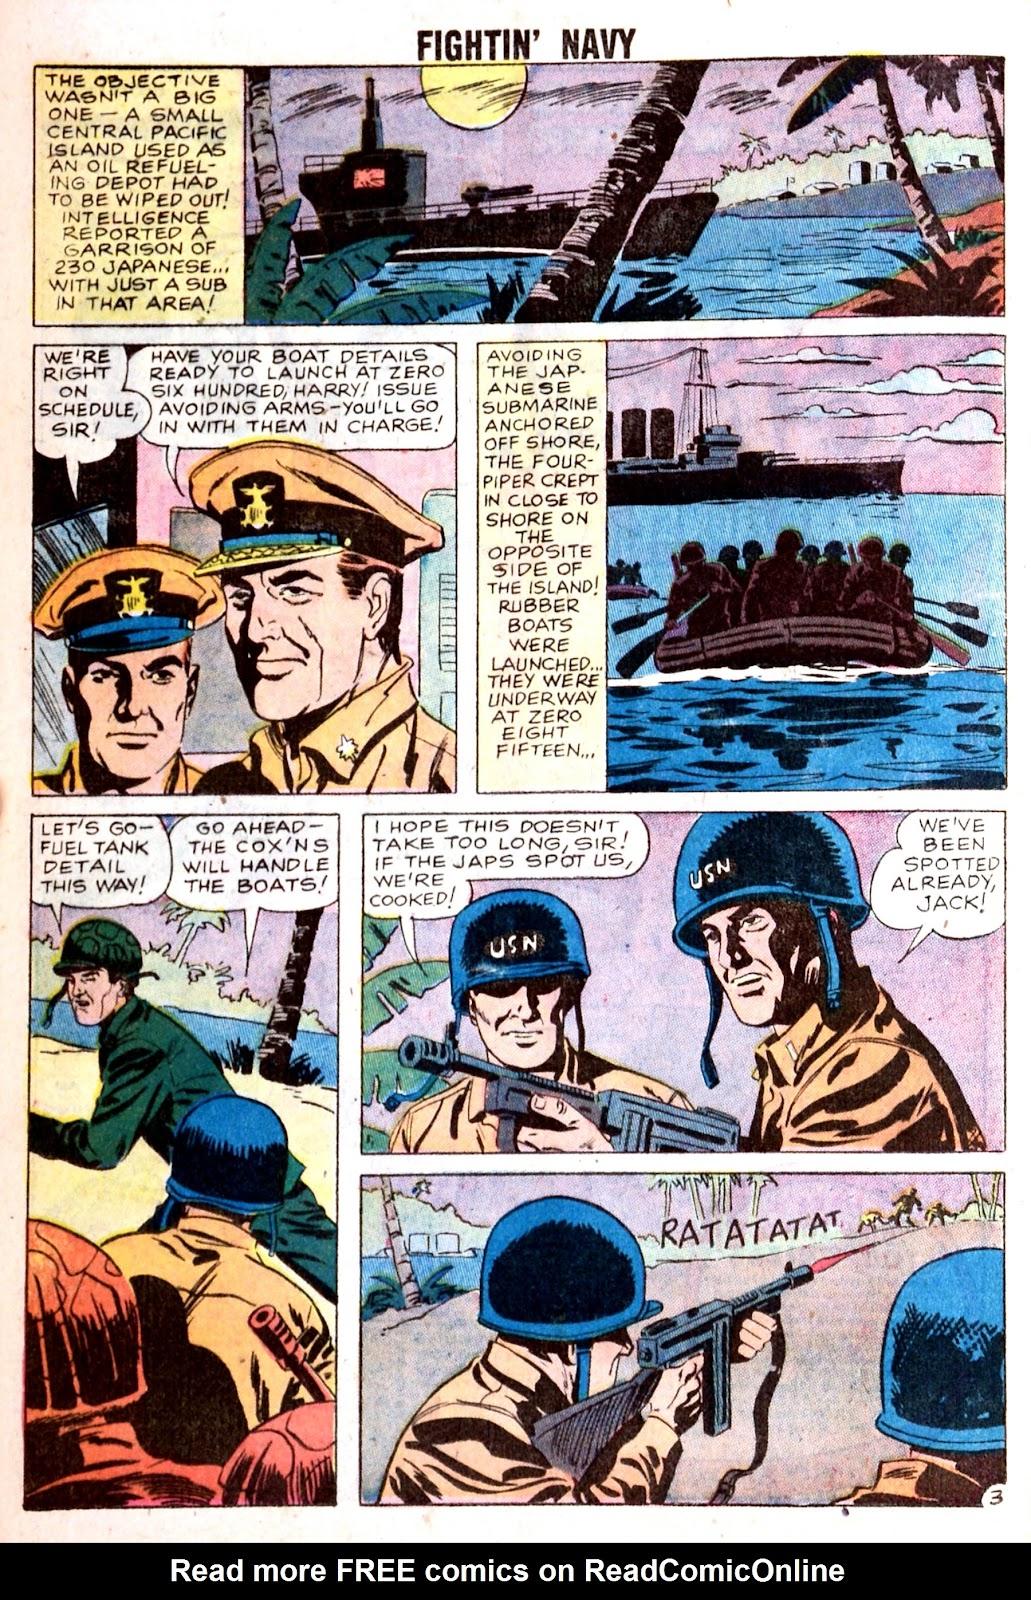 Read online Fightin' Navy comic -  Issue #85 - 16